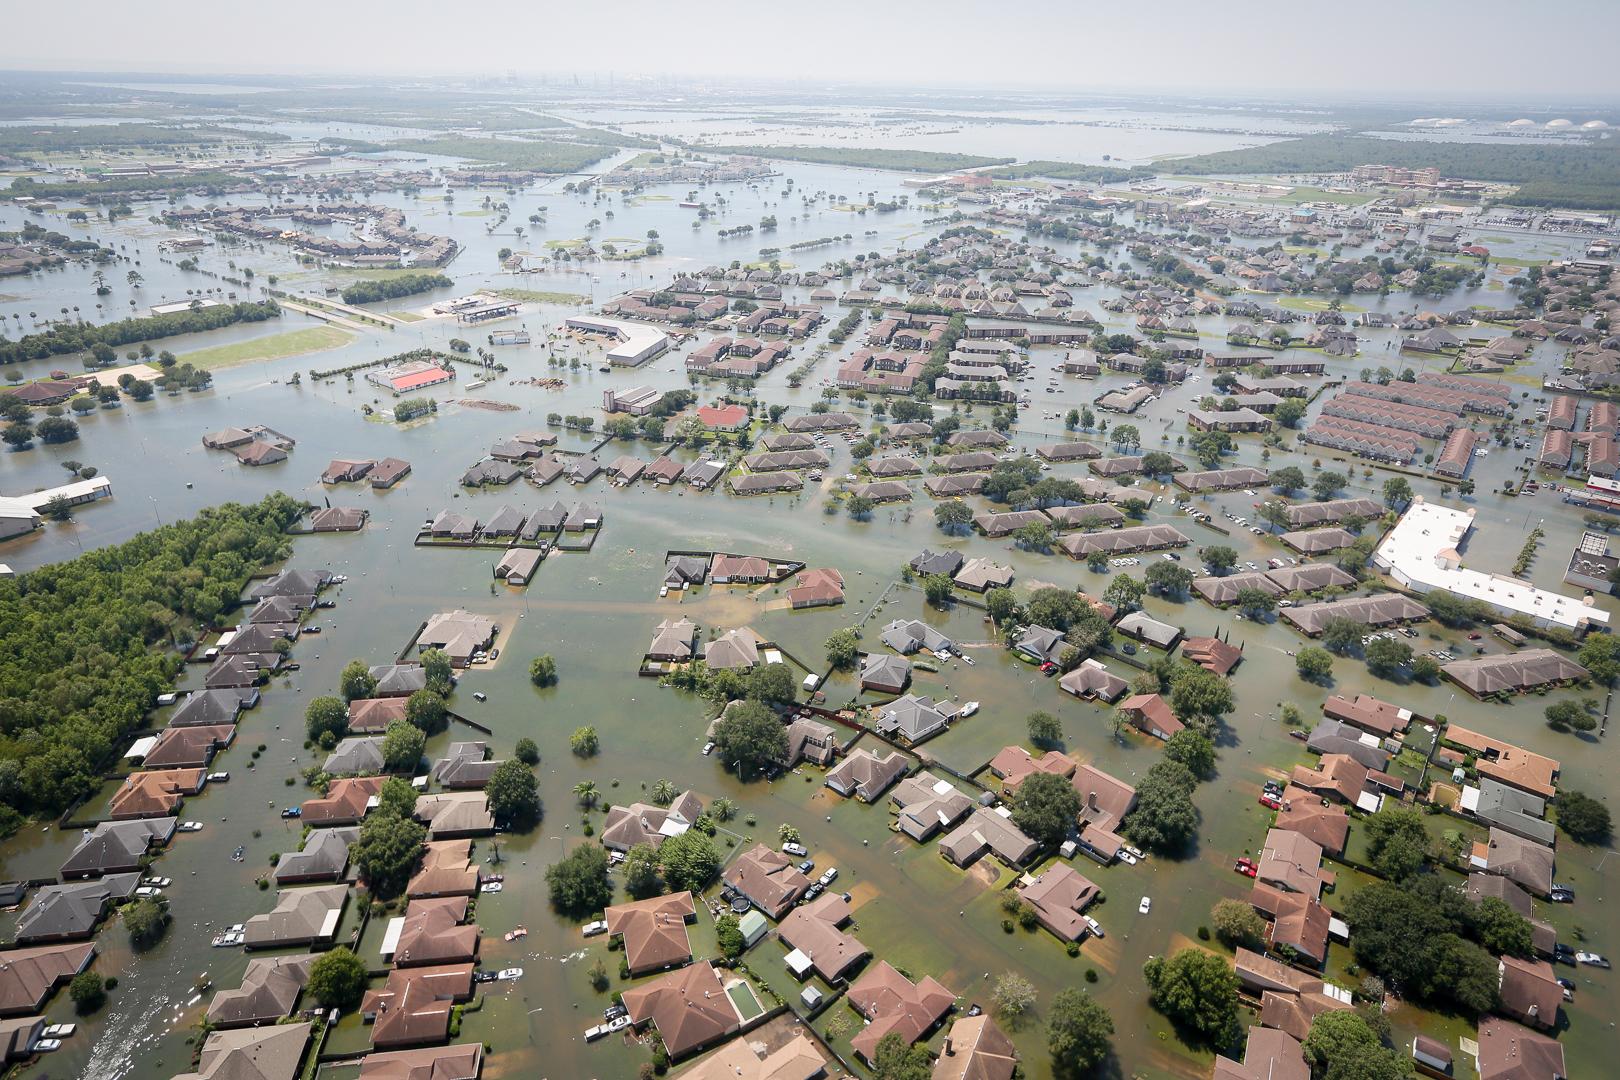 South Carolina National Guard aids Southeast Texas after Hurricane Harvey